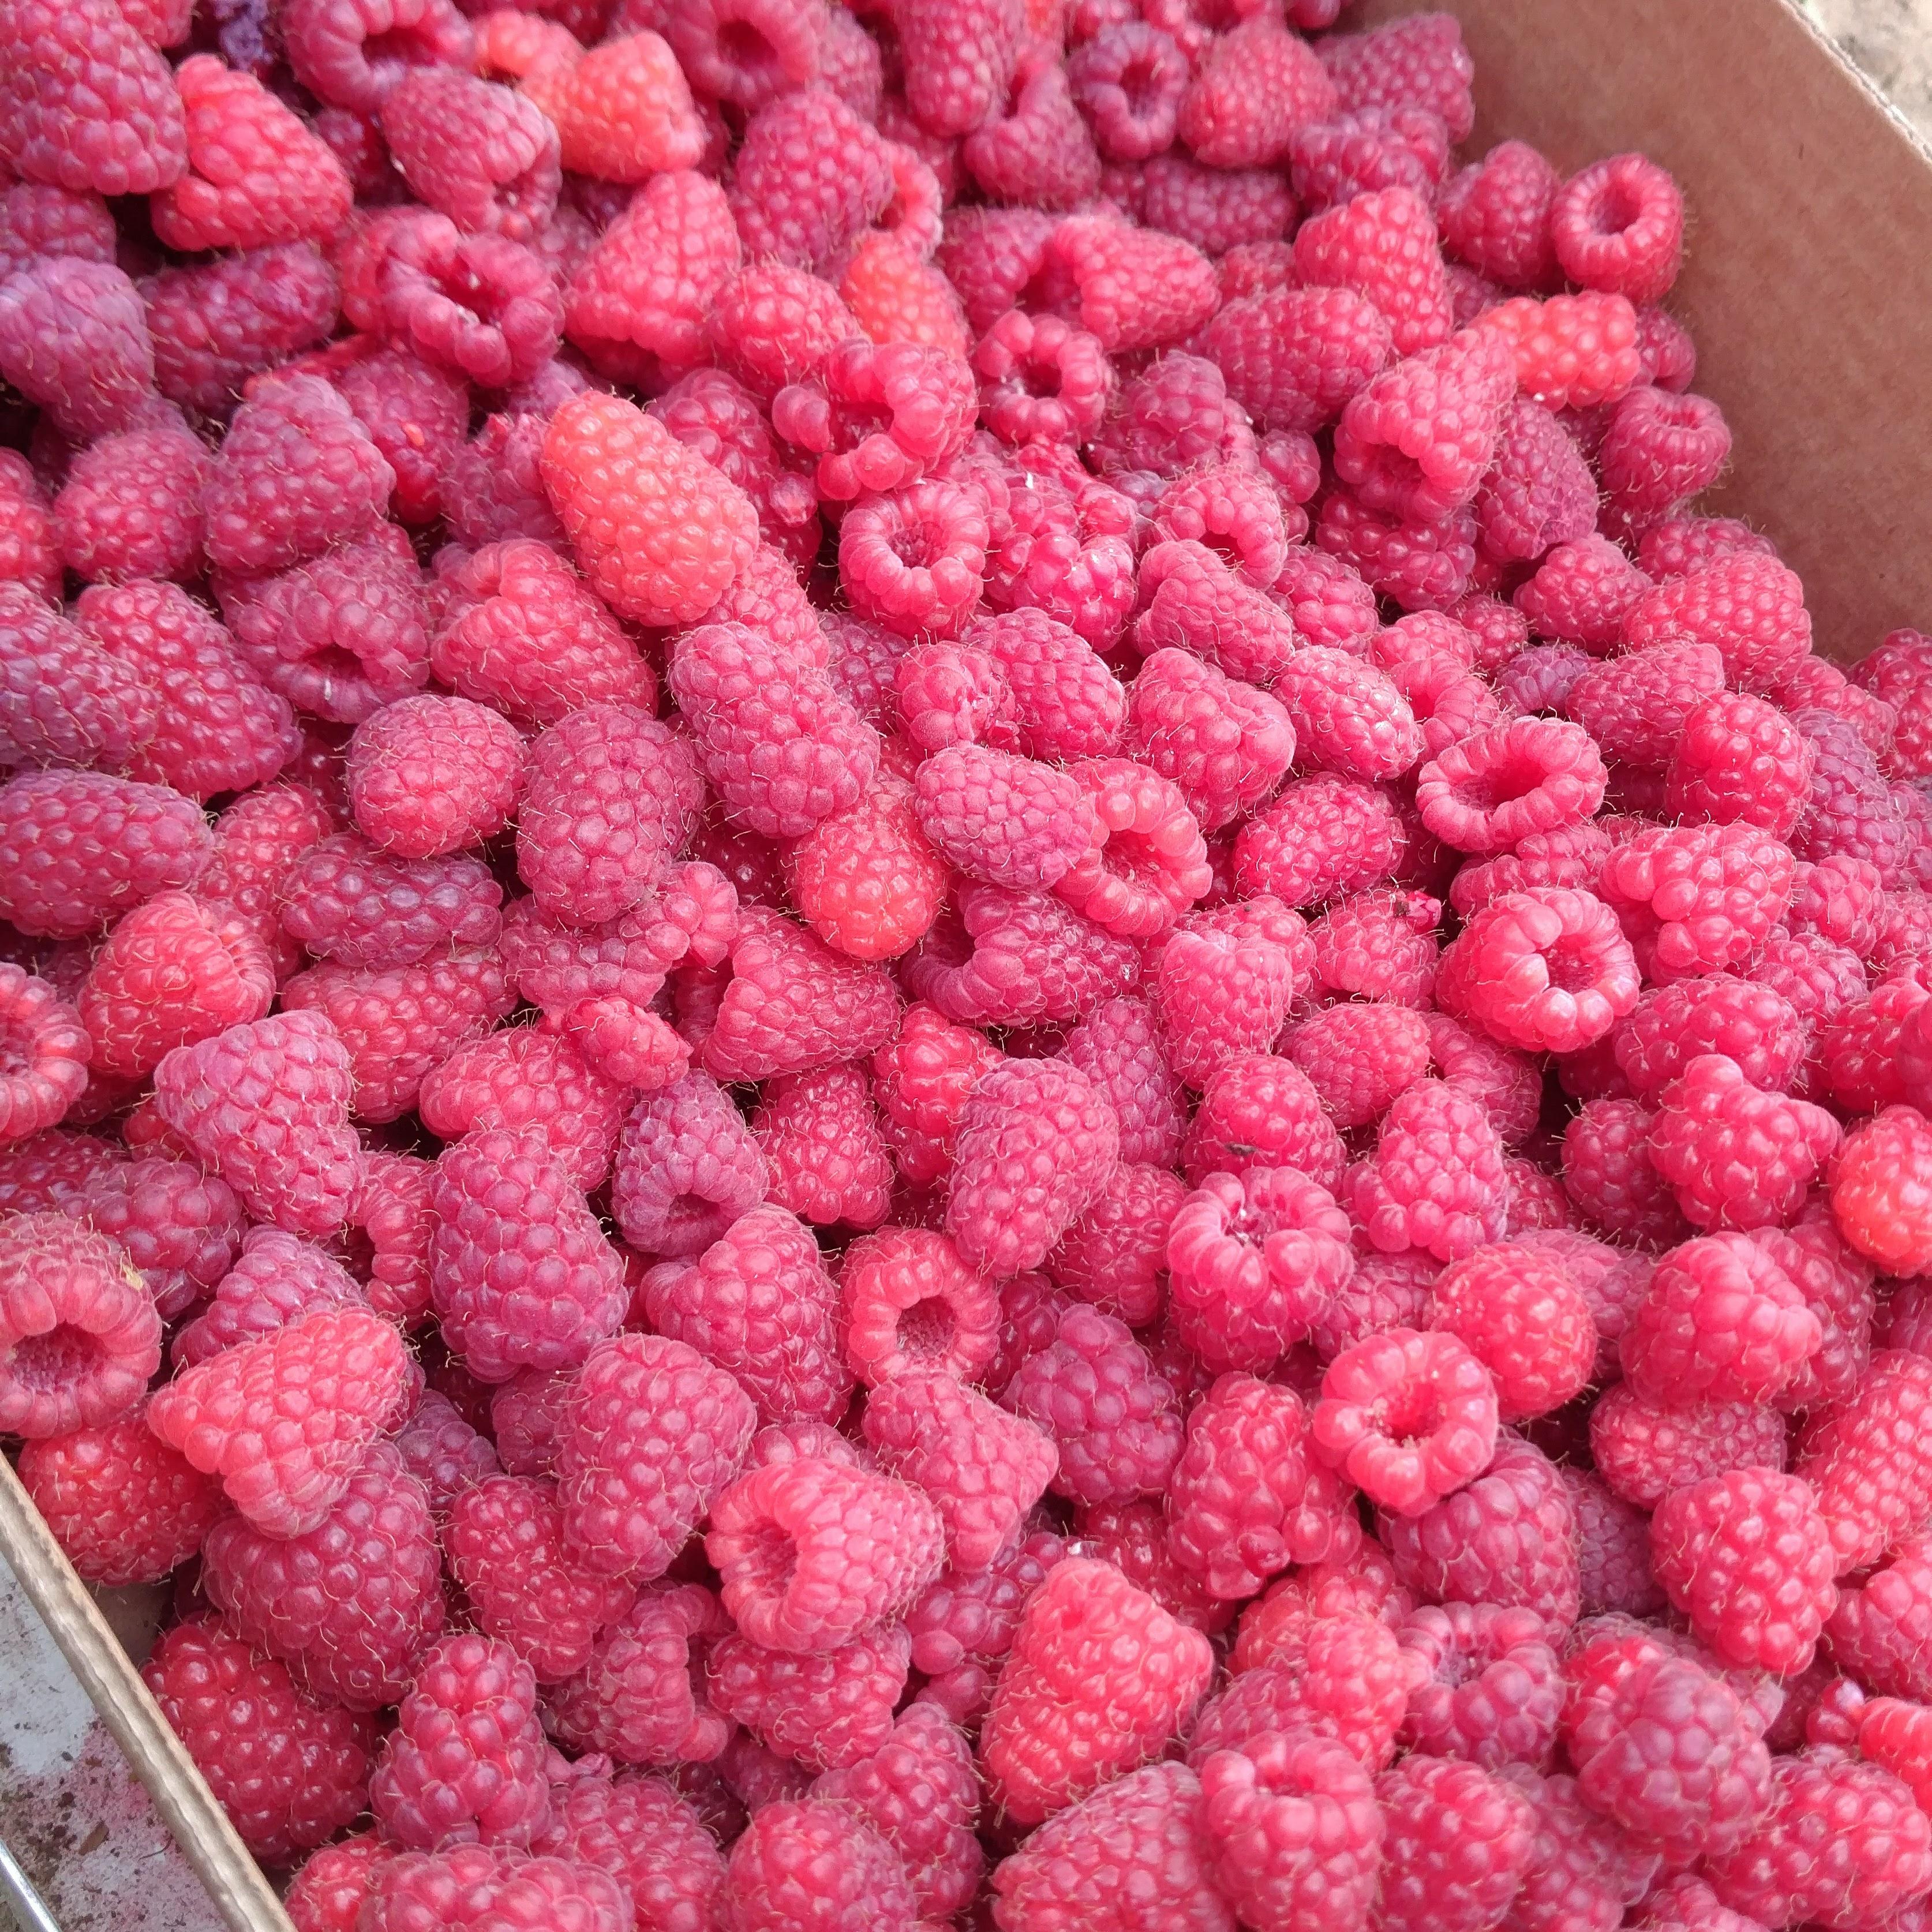 Raspberry Picking 2017